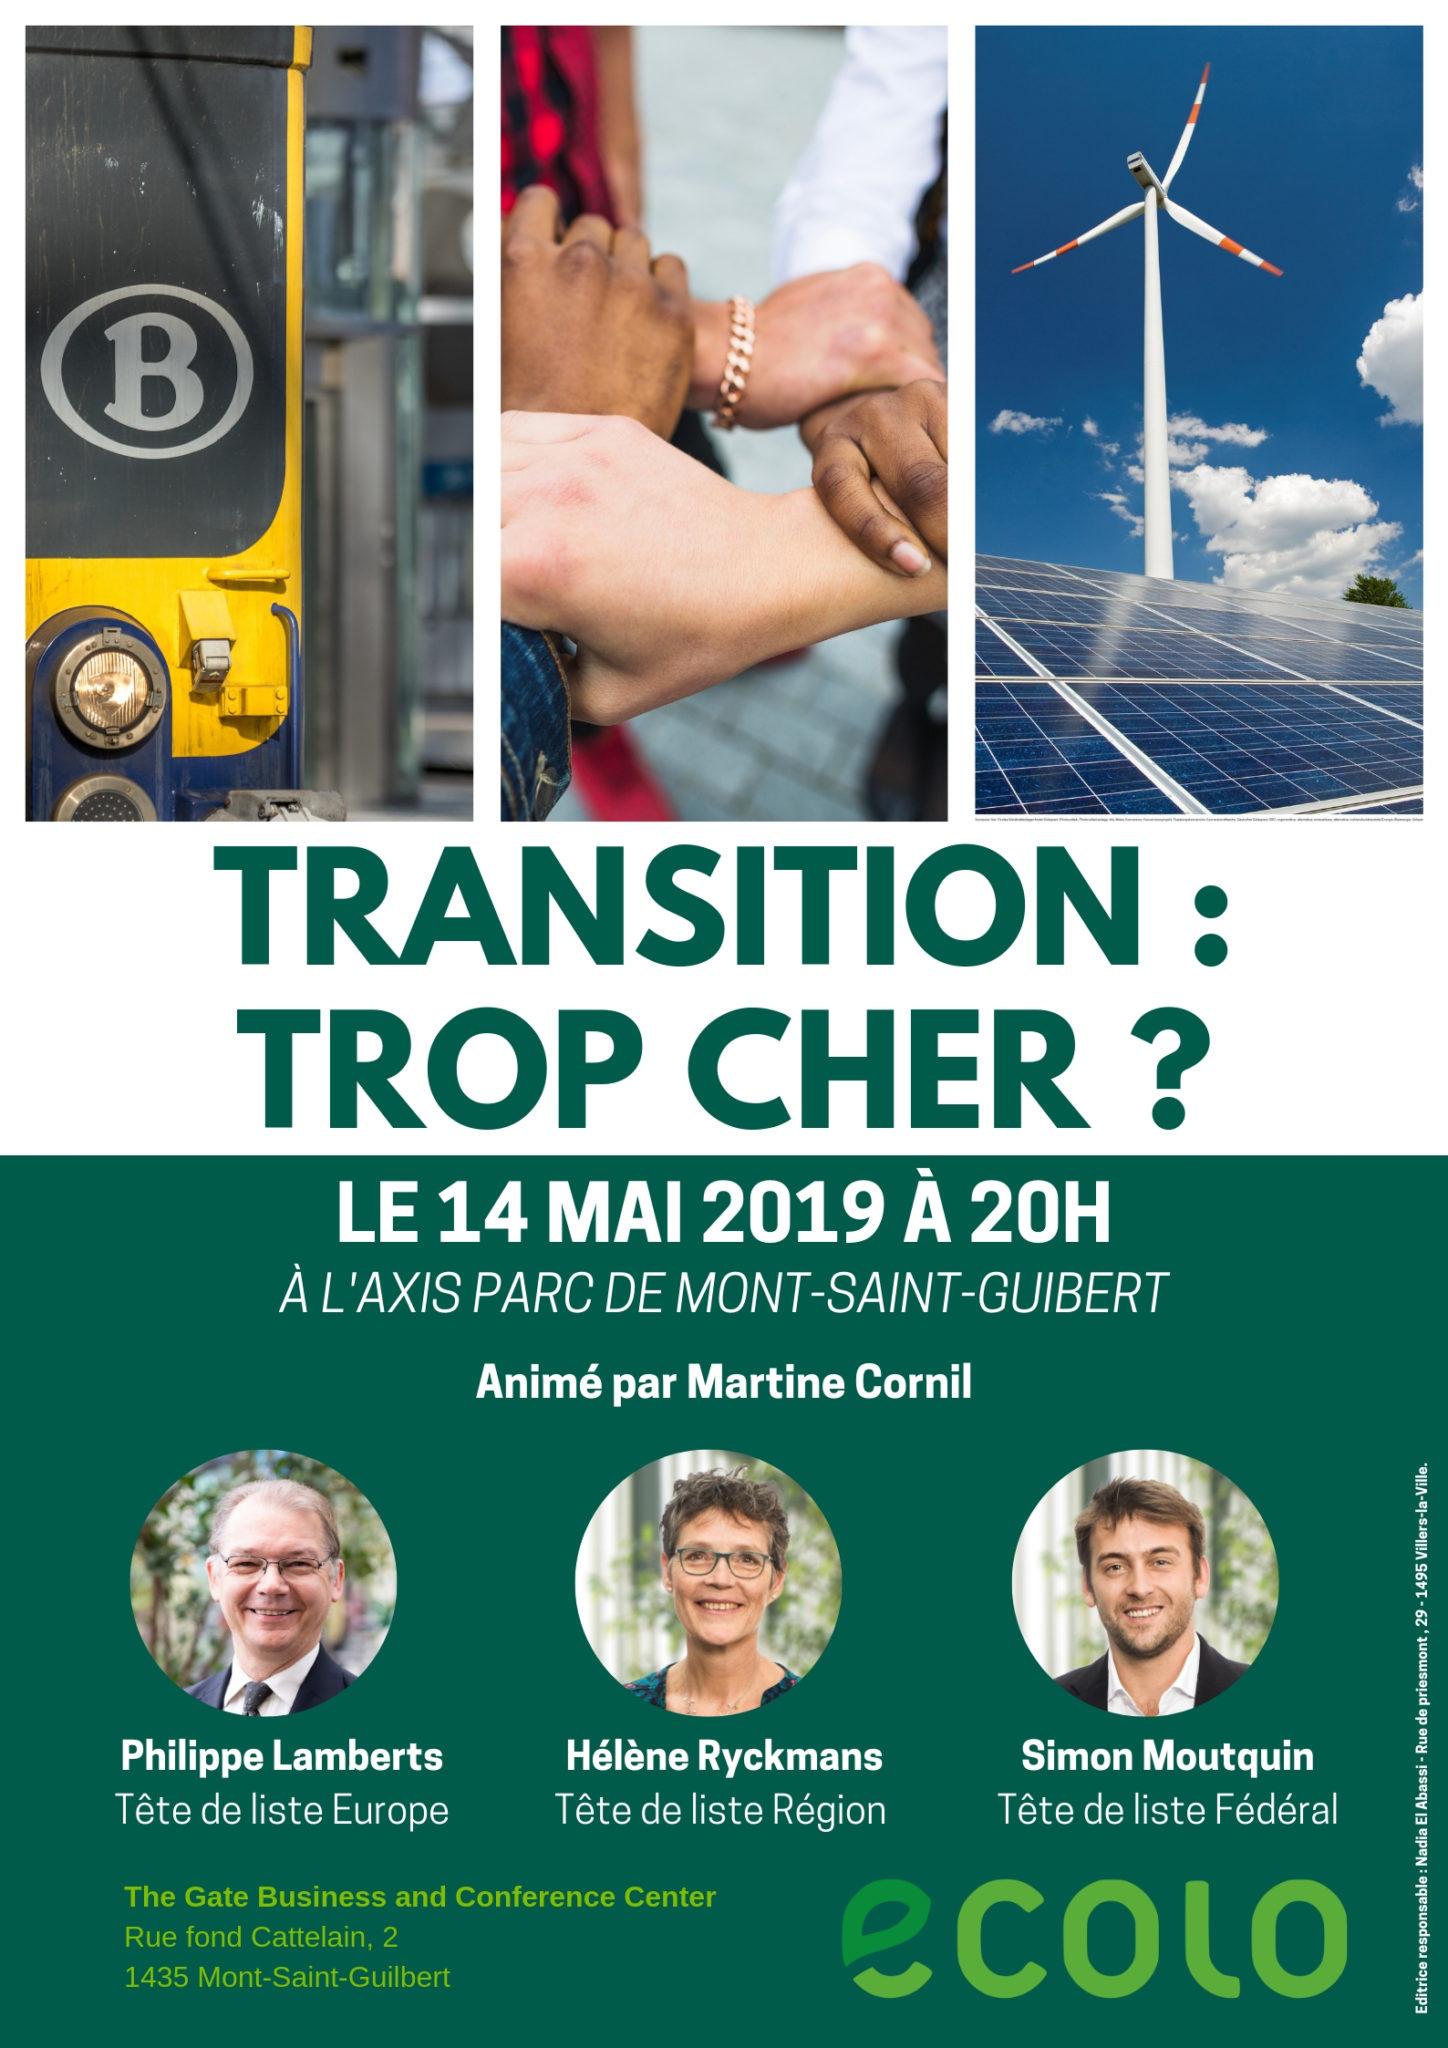 TransitionTropCher_Affiche